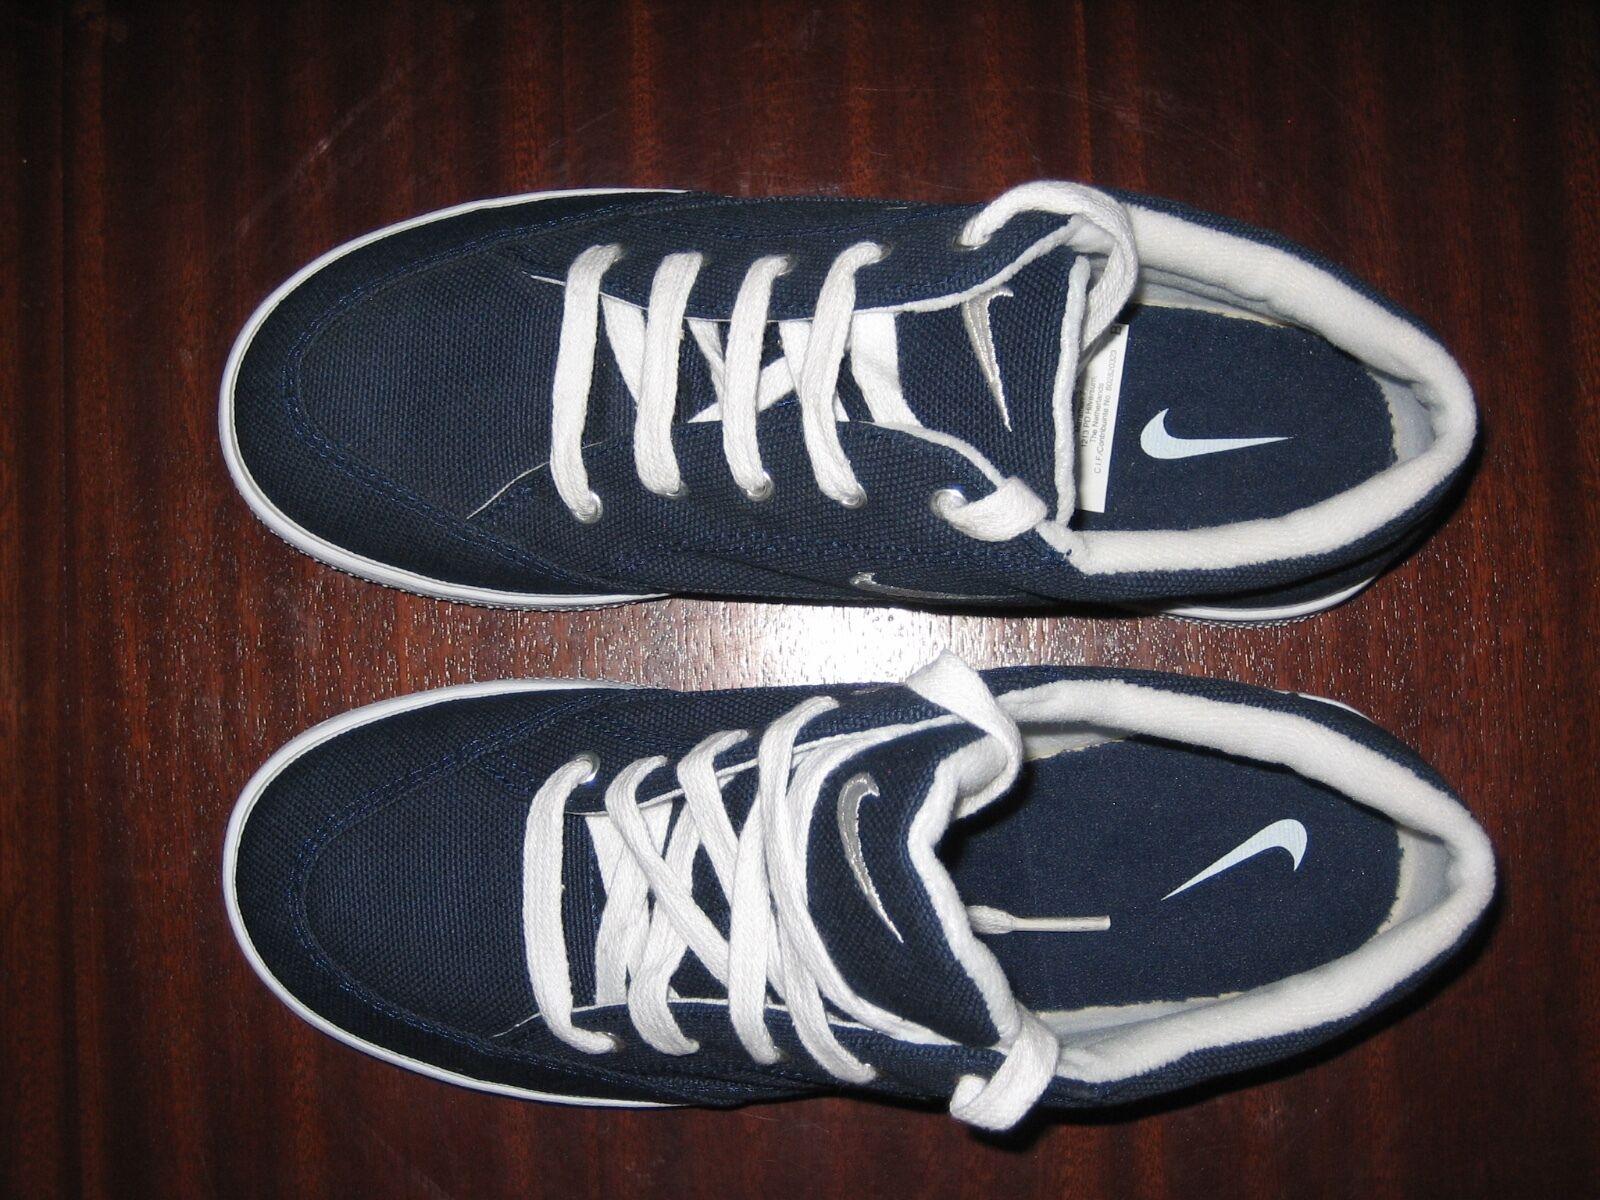 Nike Canvas GTS USA 5,5  NIB NOS vintage ORIGINAL air Turnschuhe skate urban denim air ORIGINAL 40f7ad